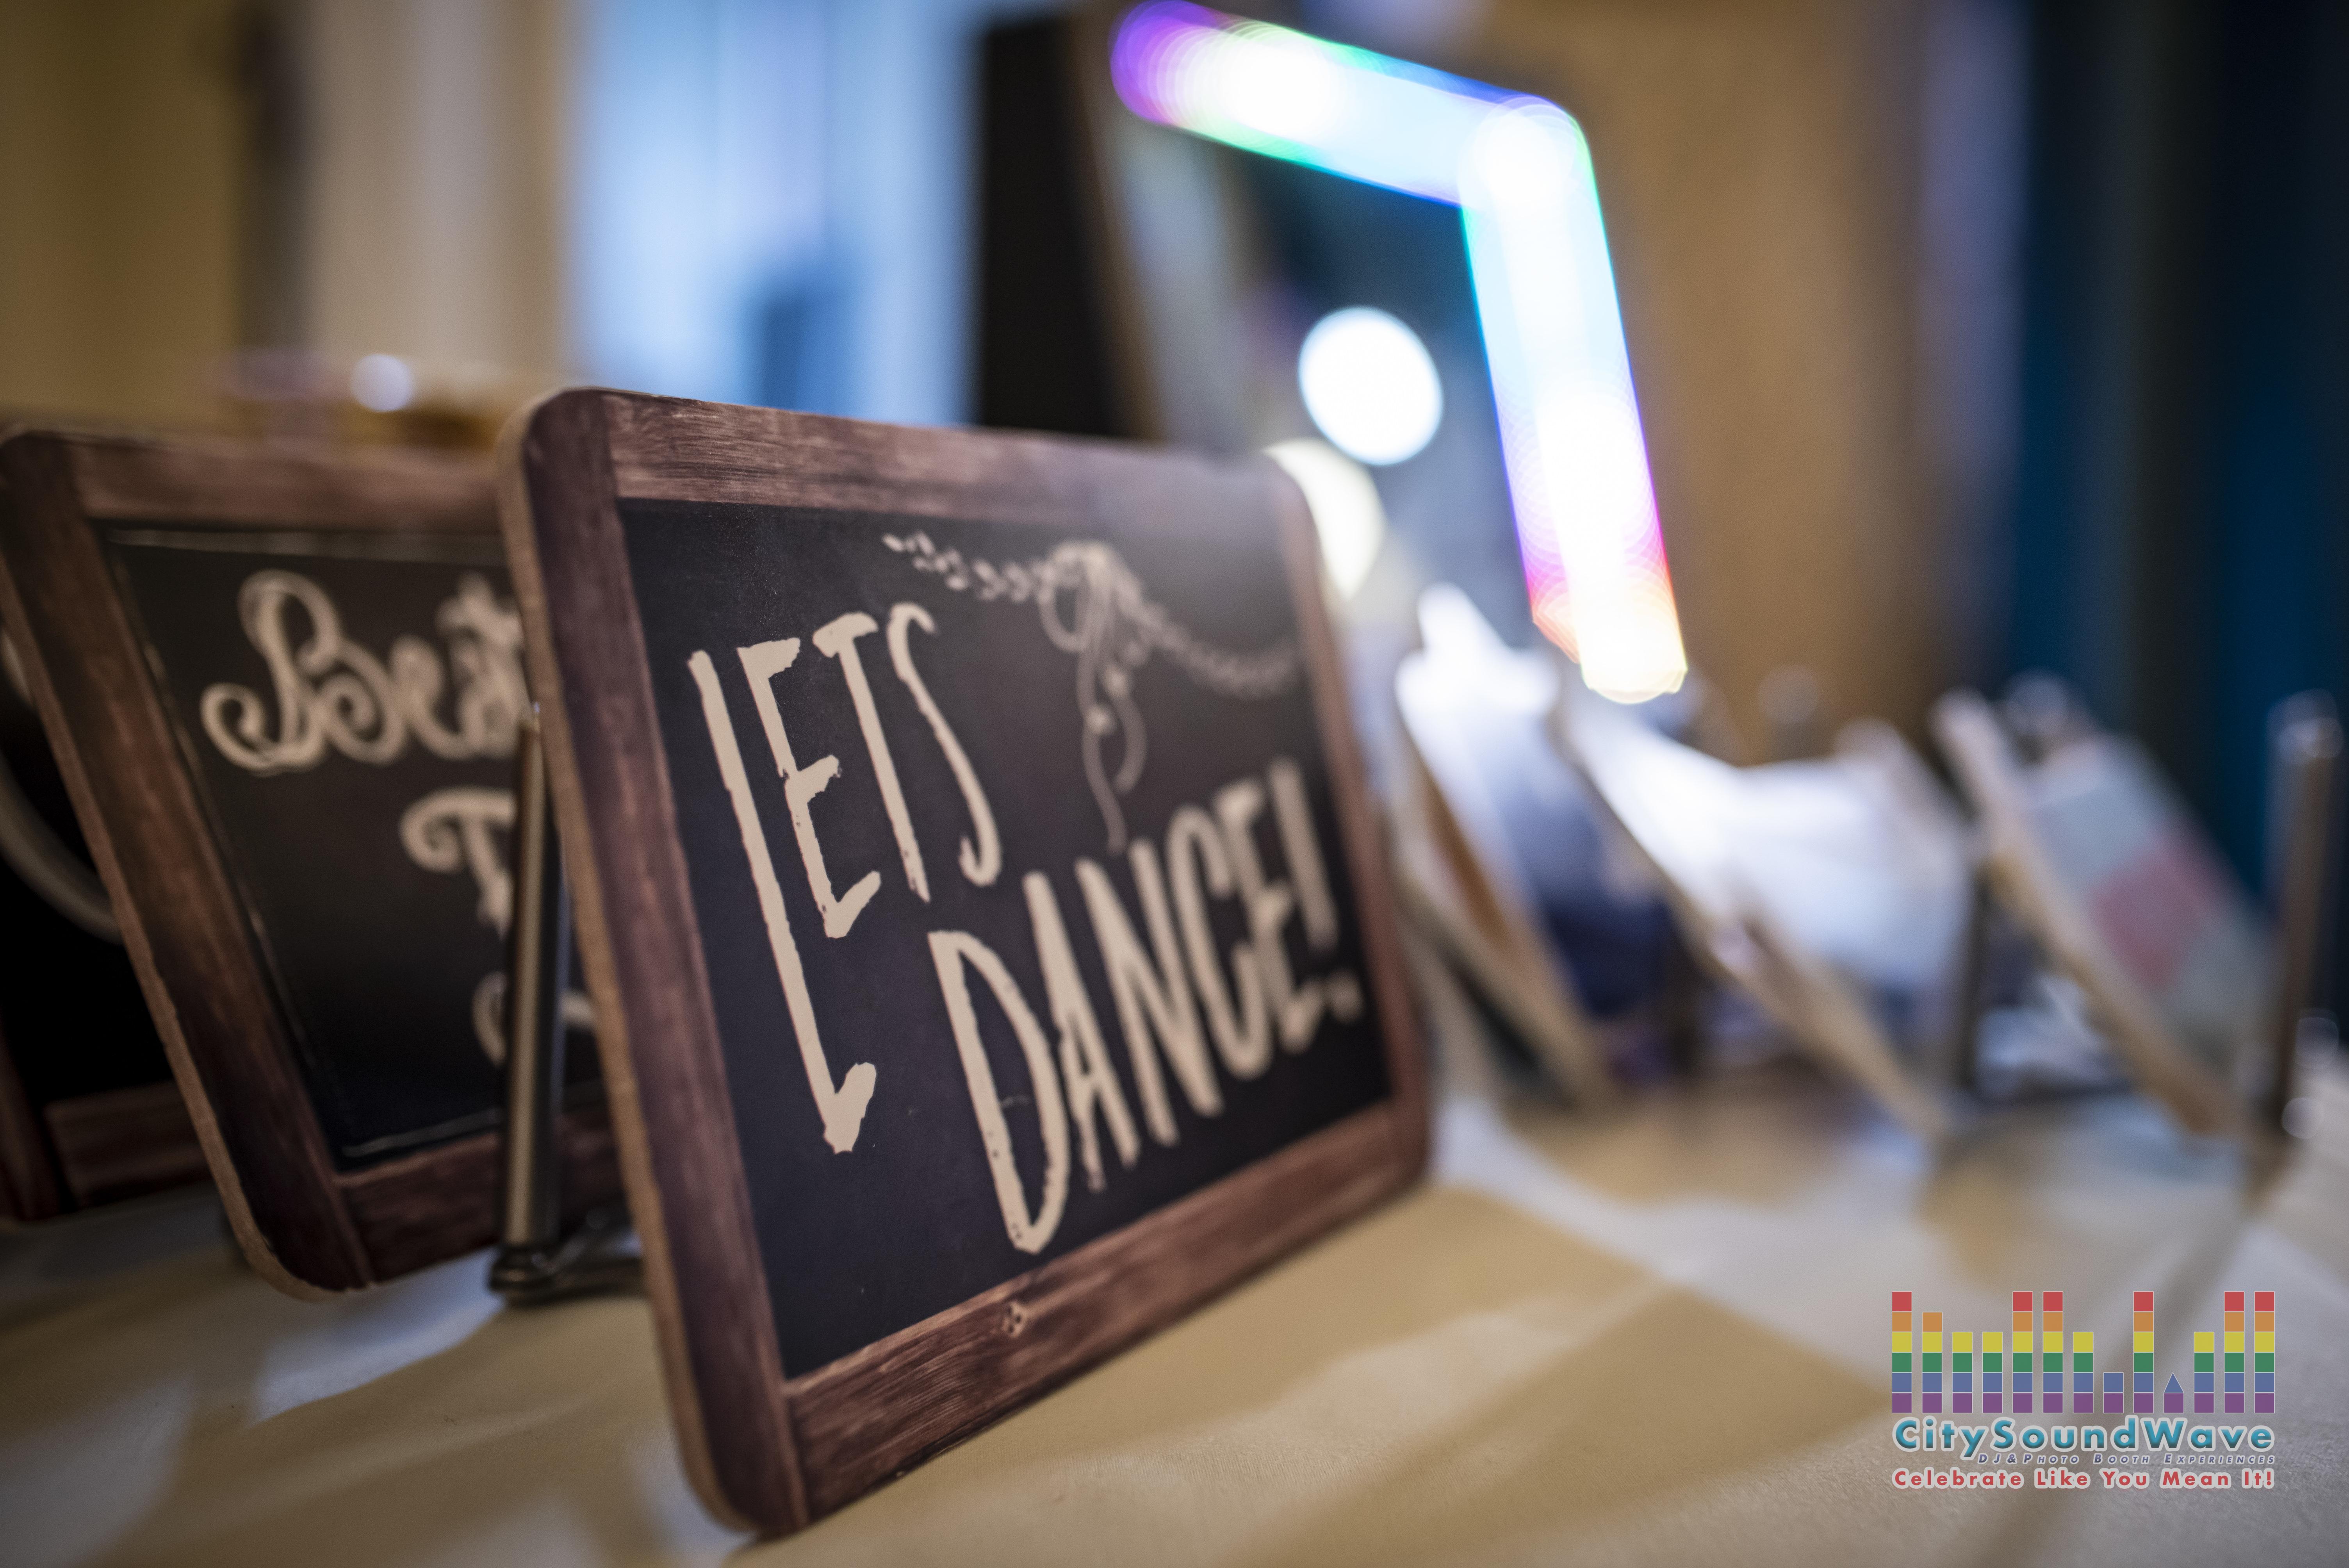 Let's Dance Props